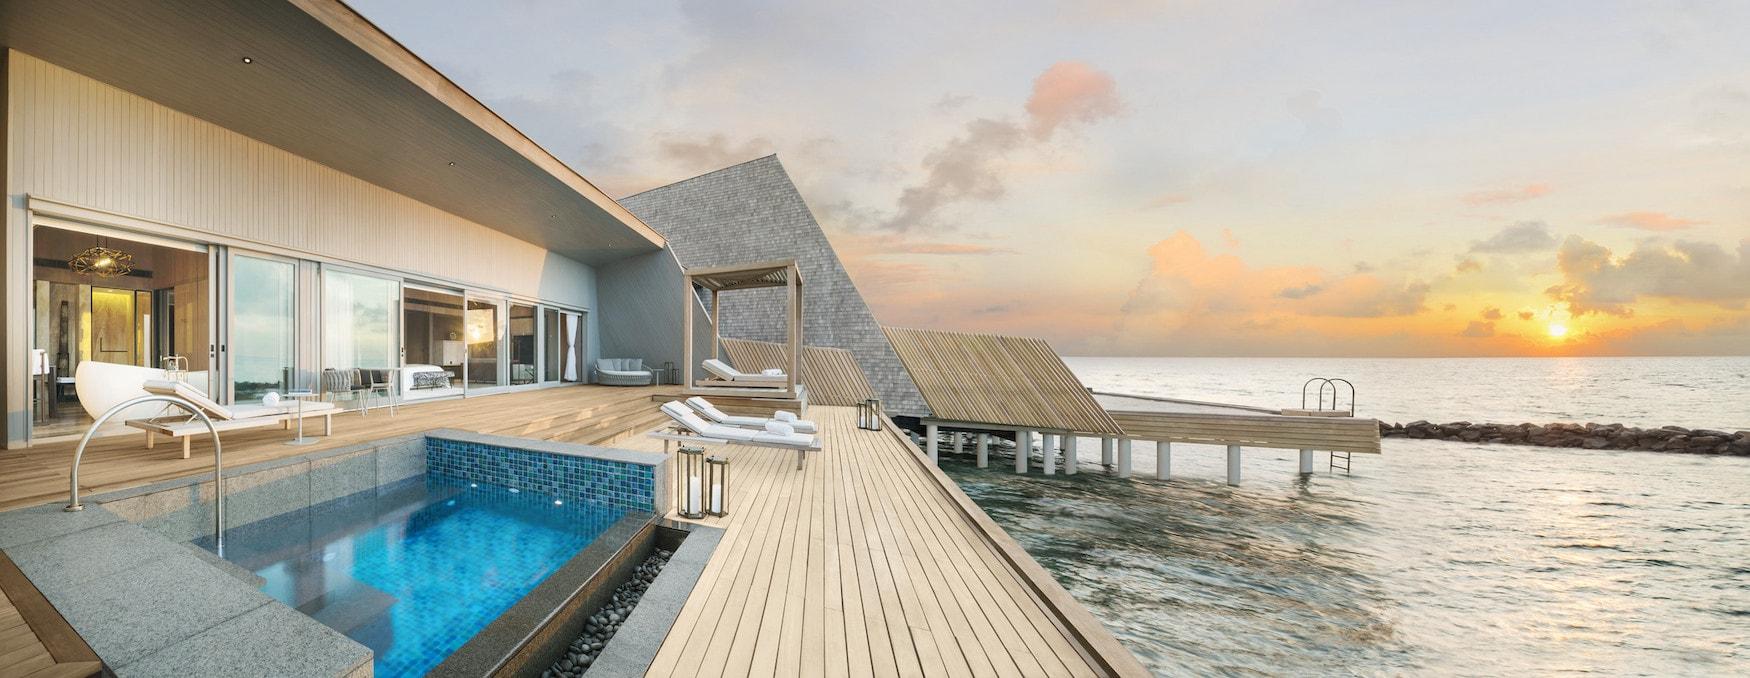 Pool Villa des St. Regis Astor Estate auf den Malediven